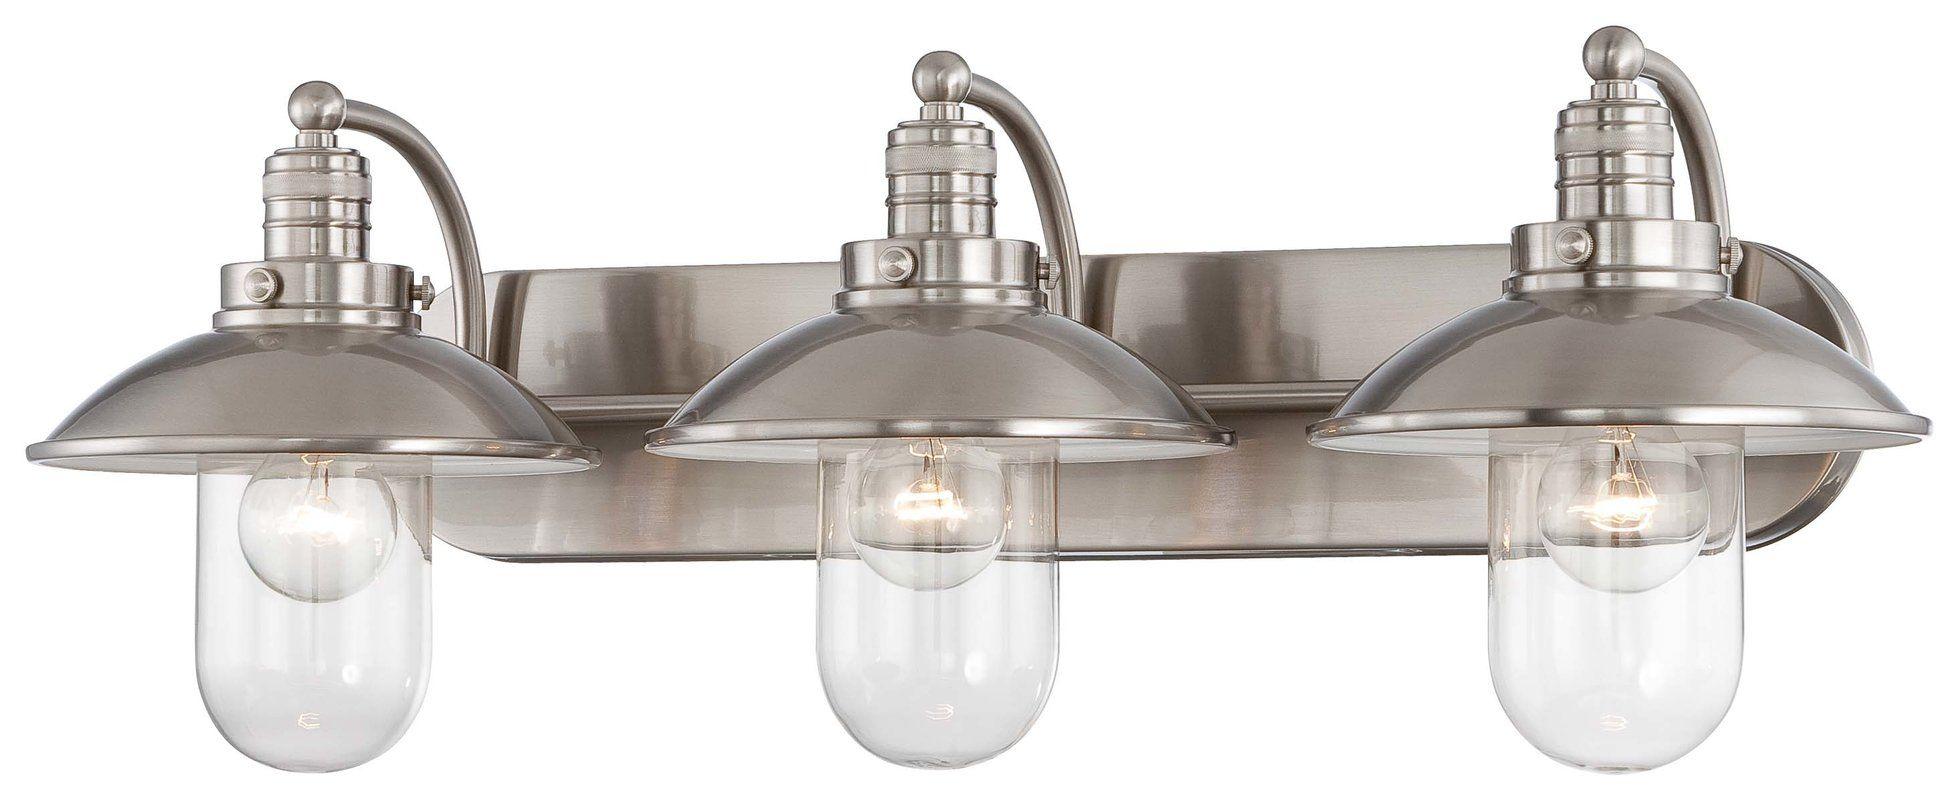 29900 emory 3light vanity light farmhouse bathroom